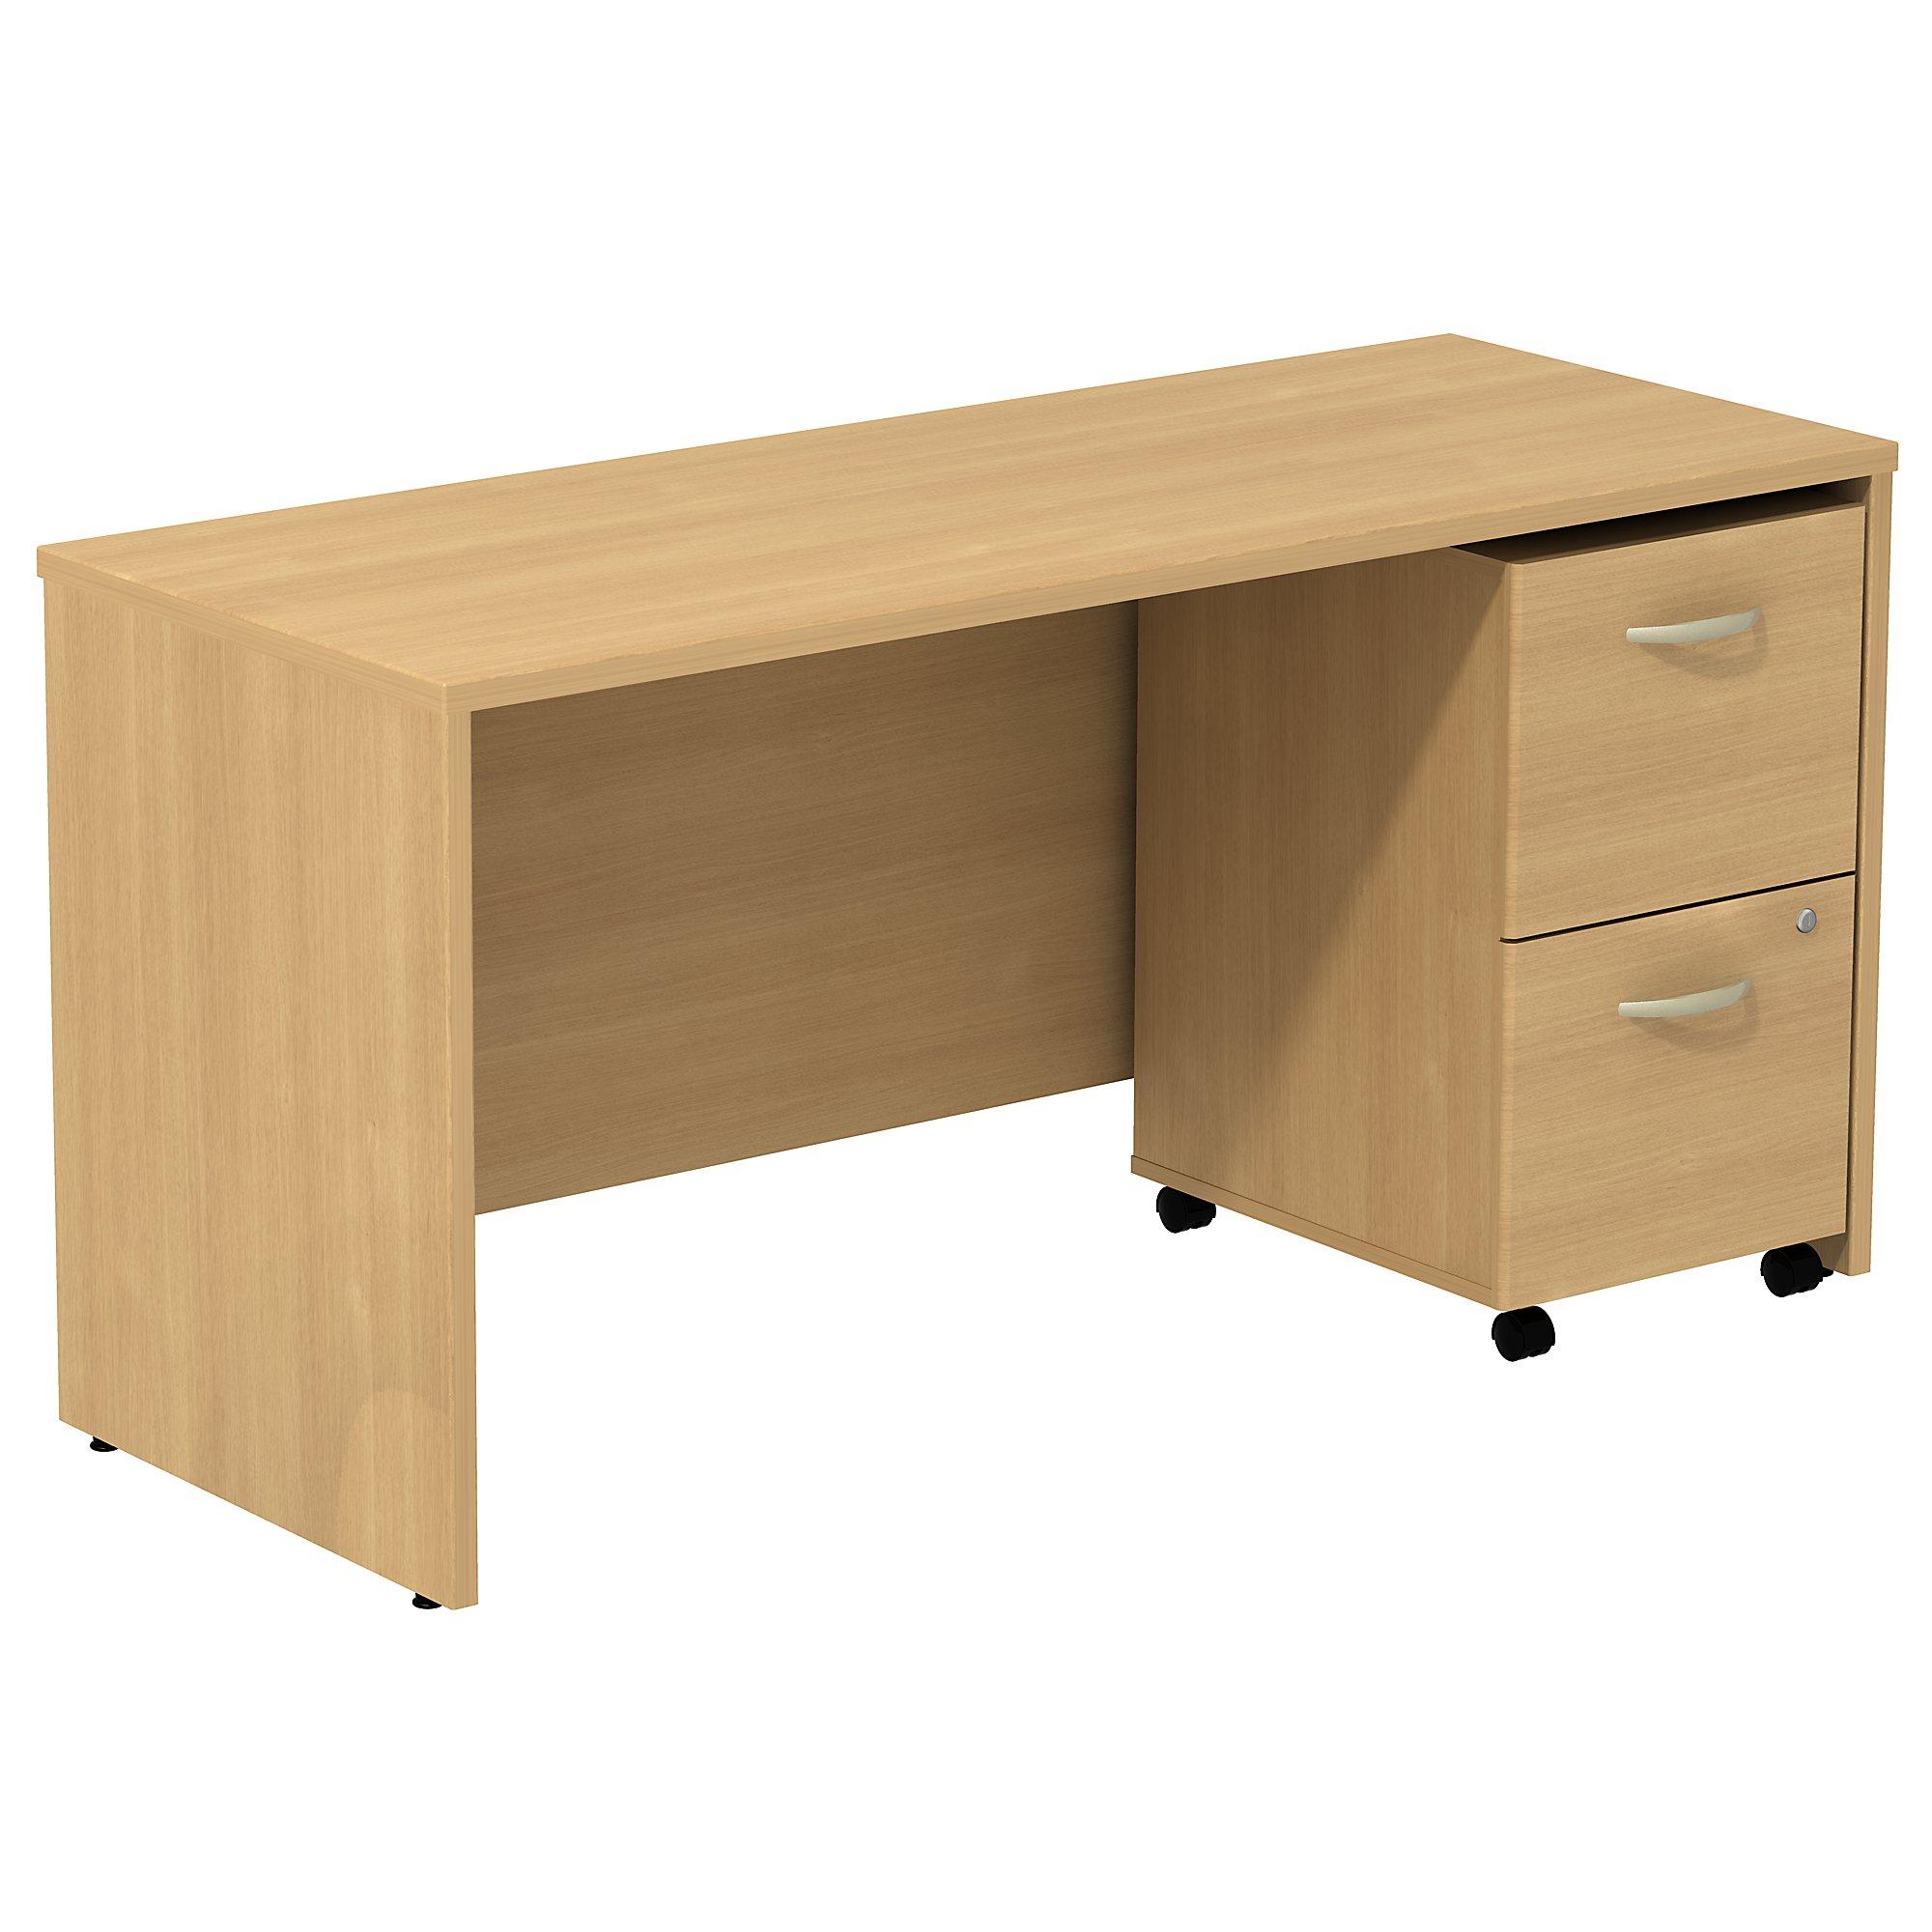 "light oak series c 60"" credenza desk"